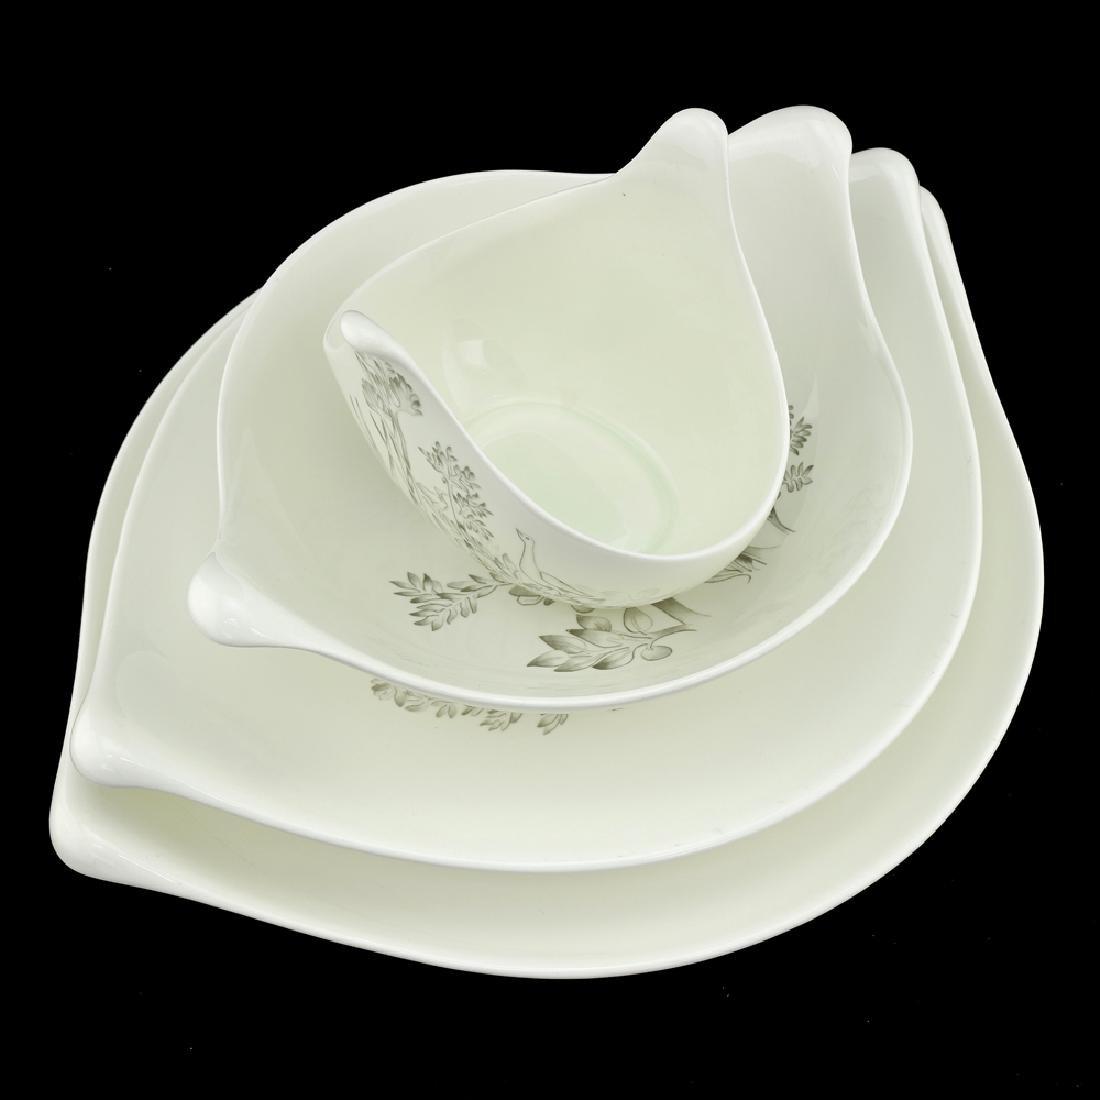 Zeisel Hallcraft Century Nesting Serving Bowls - 3